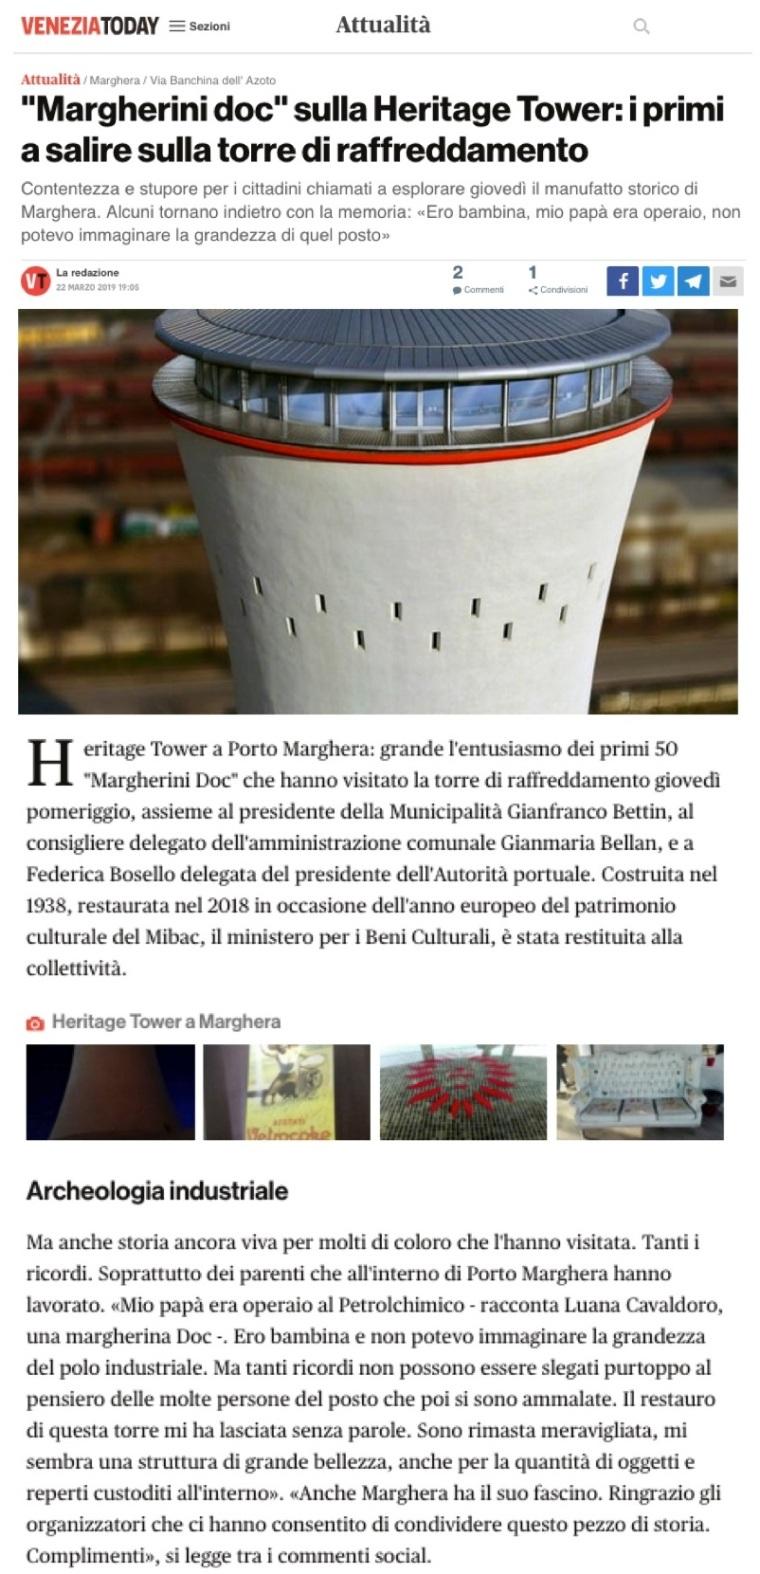 MArghera forever - Alfabeto di Marghera - Venezia Today 22 marzo 2019.jpg